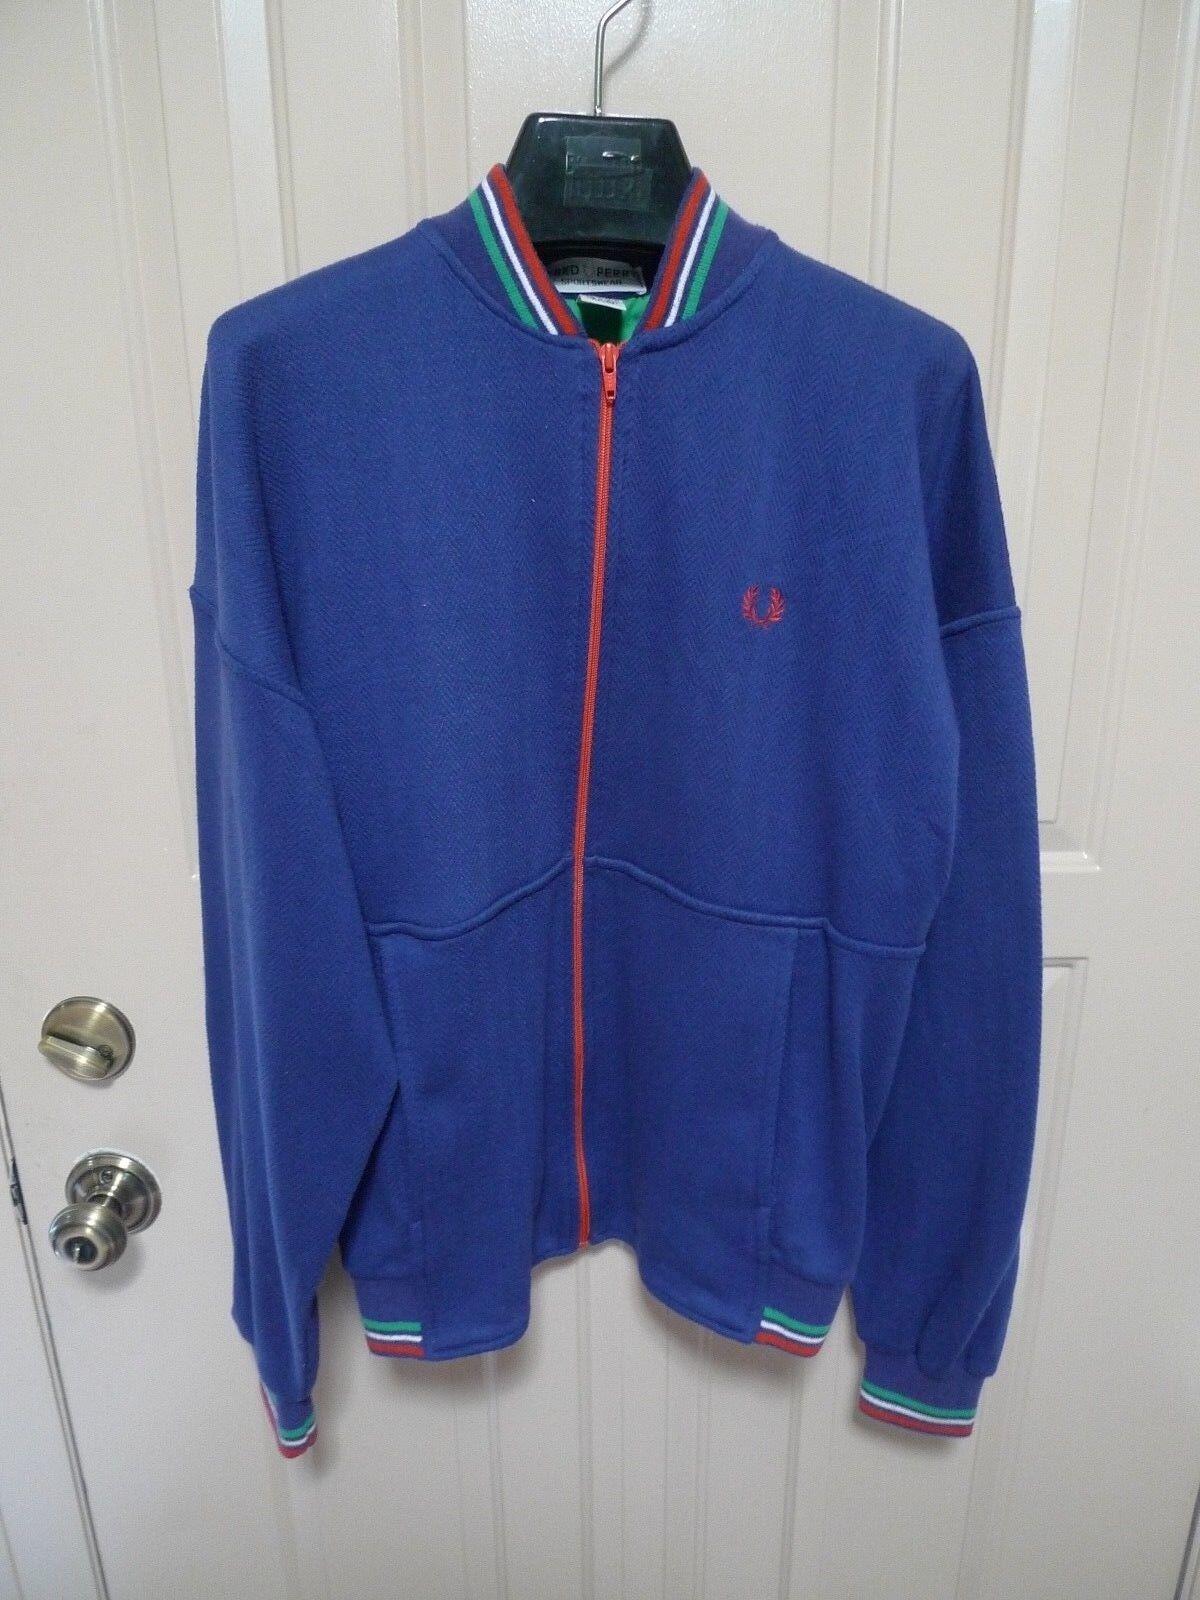 Frot Perry Sportswear-  Full Zip Track Jacket-Knitted-Herringbone Pattern-Large